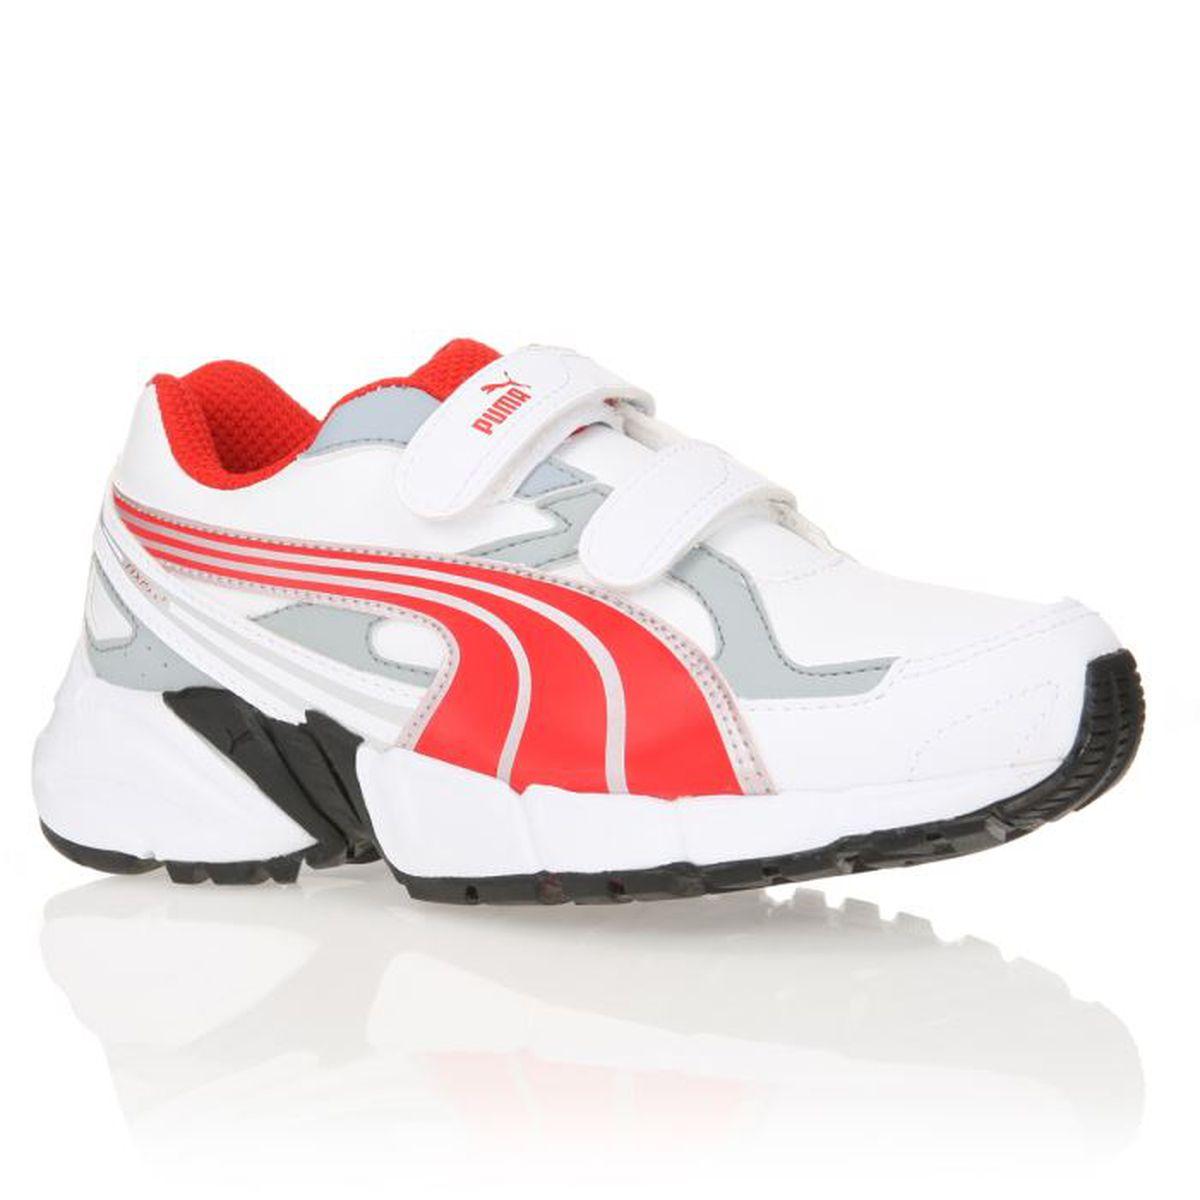 PUMA Chaussure Axis 2 SL V Enfant blanc et Rouge Achat